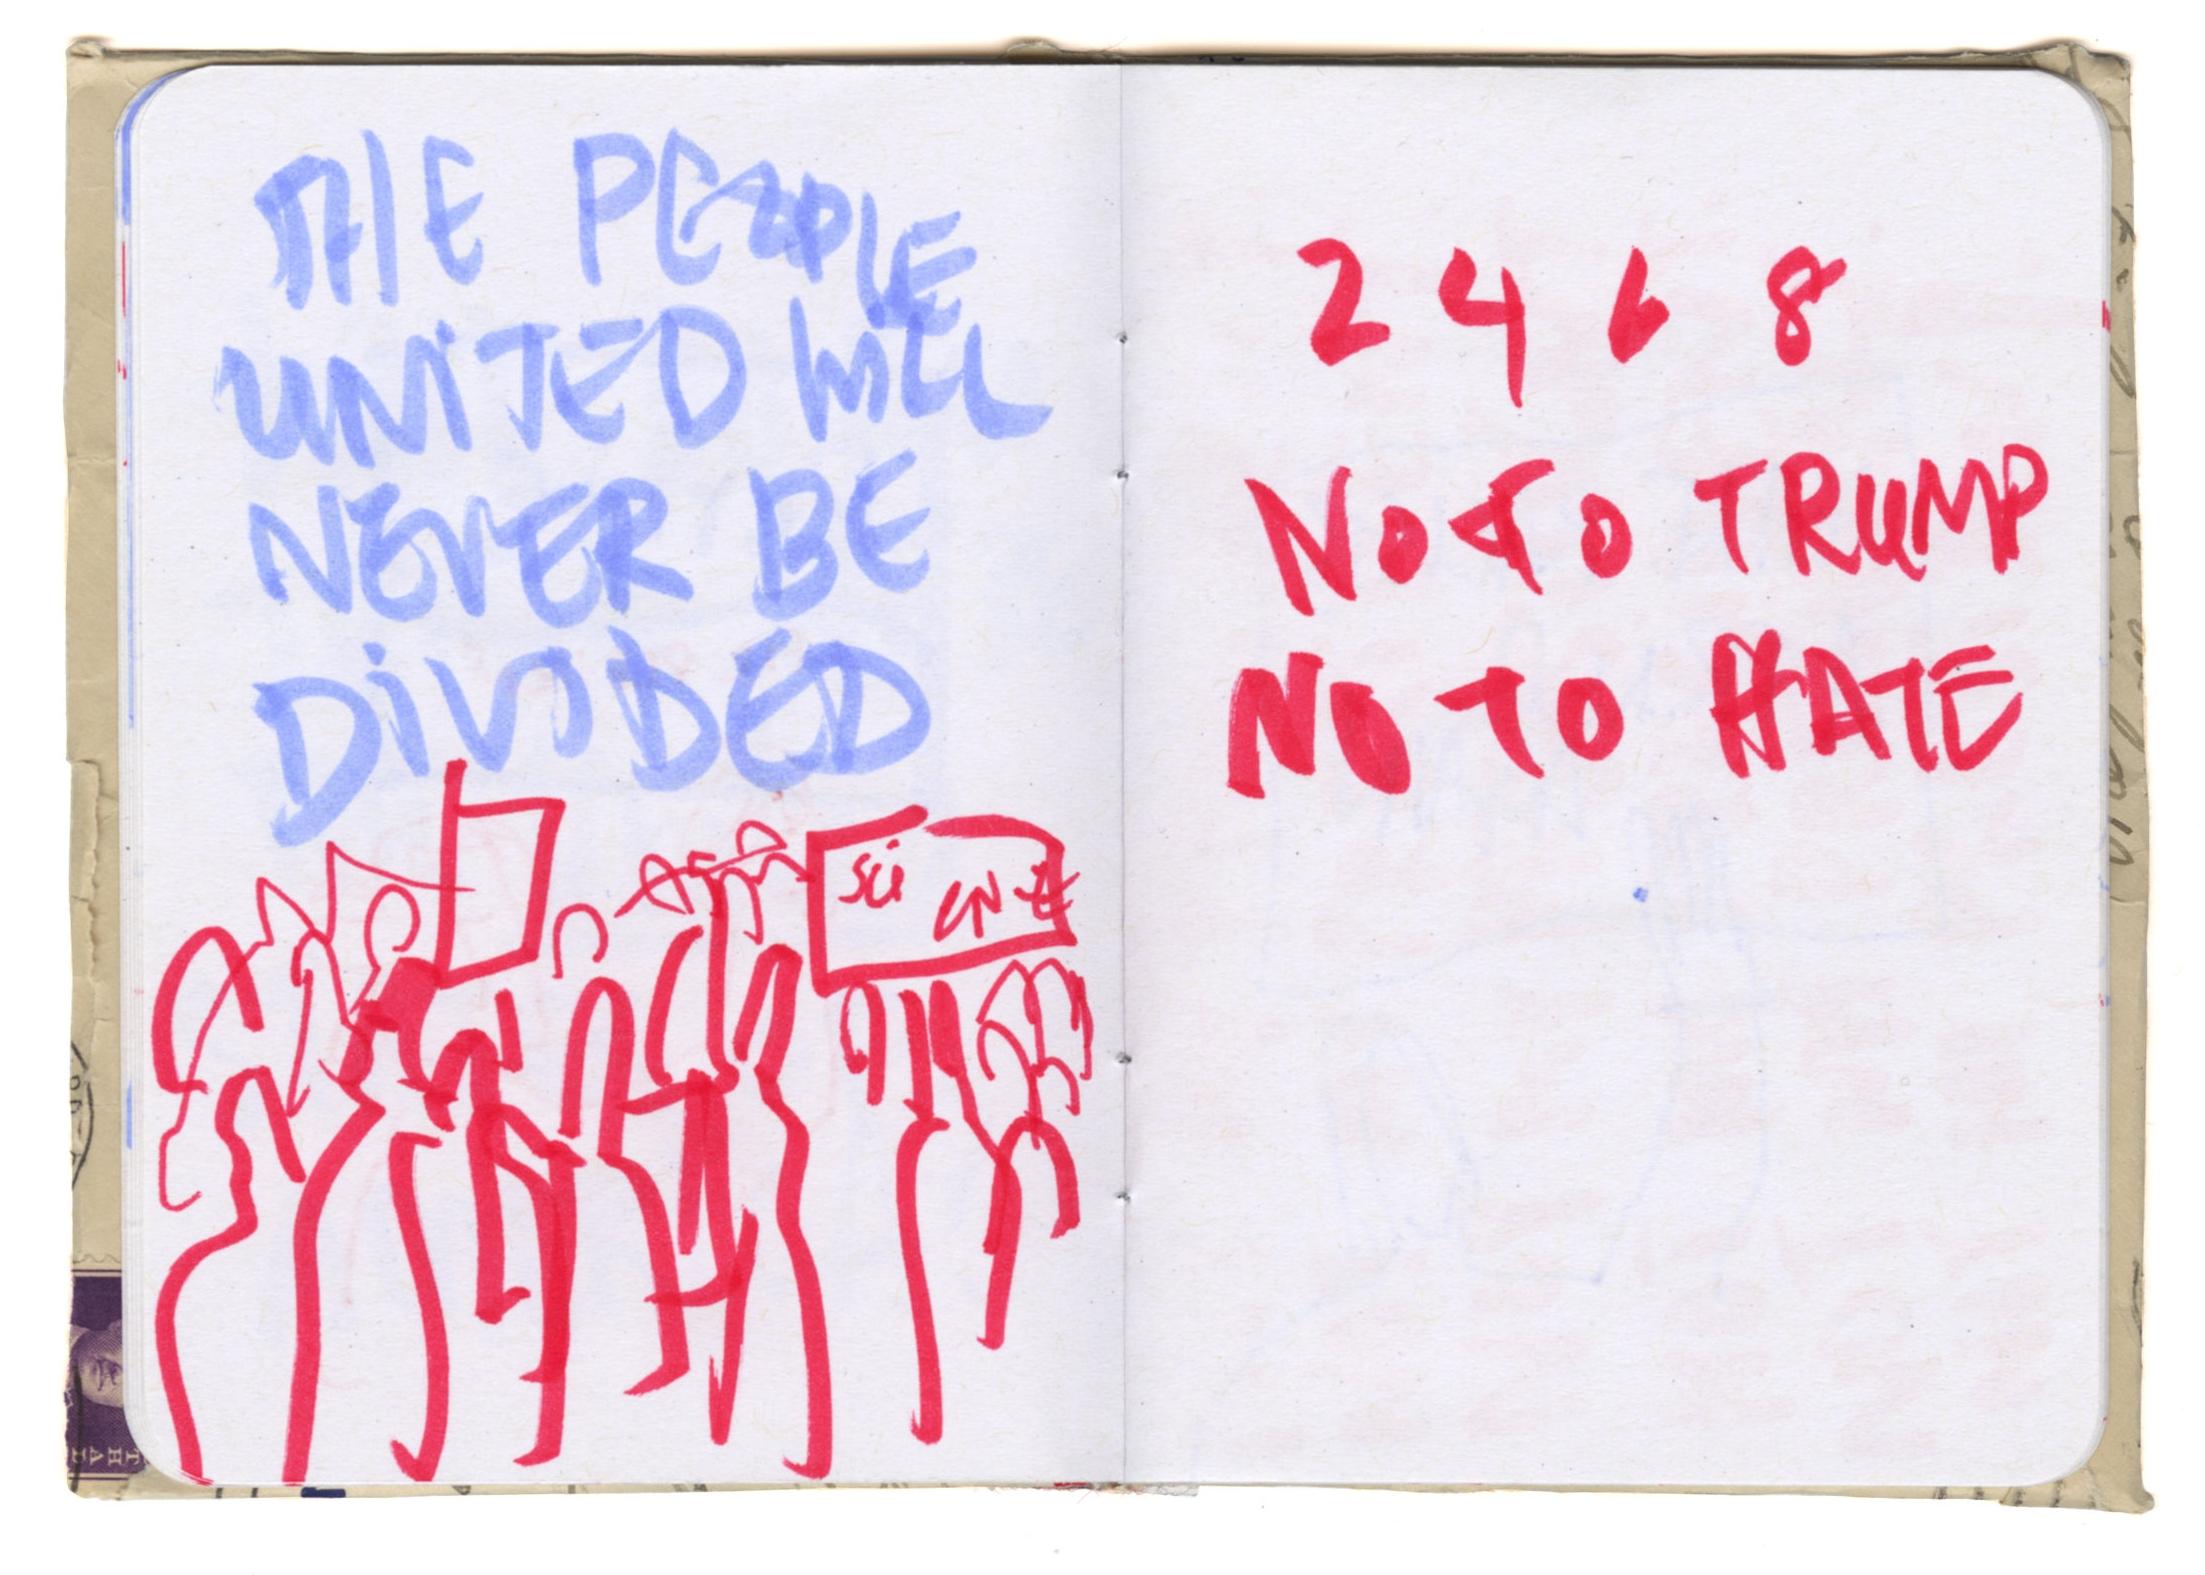 Protest_09a.jpg